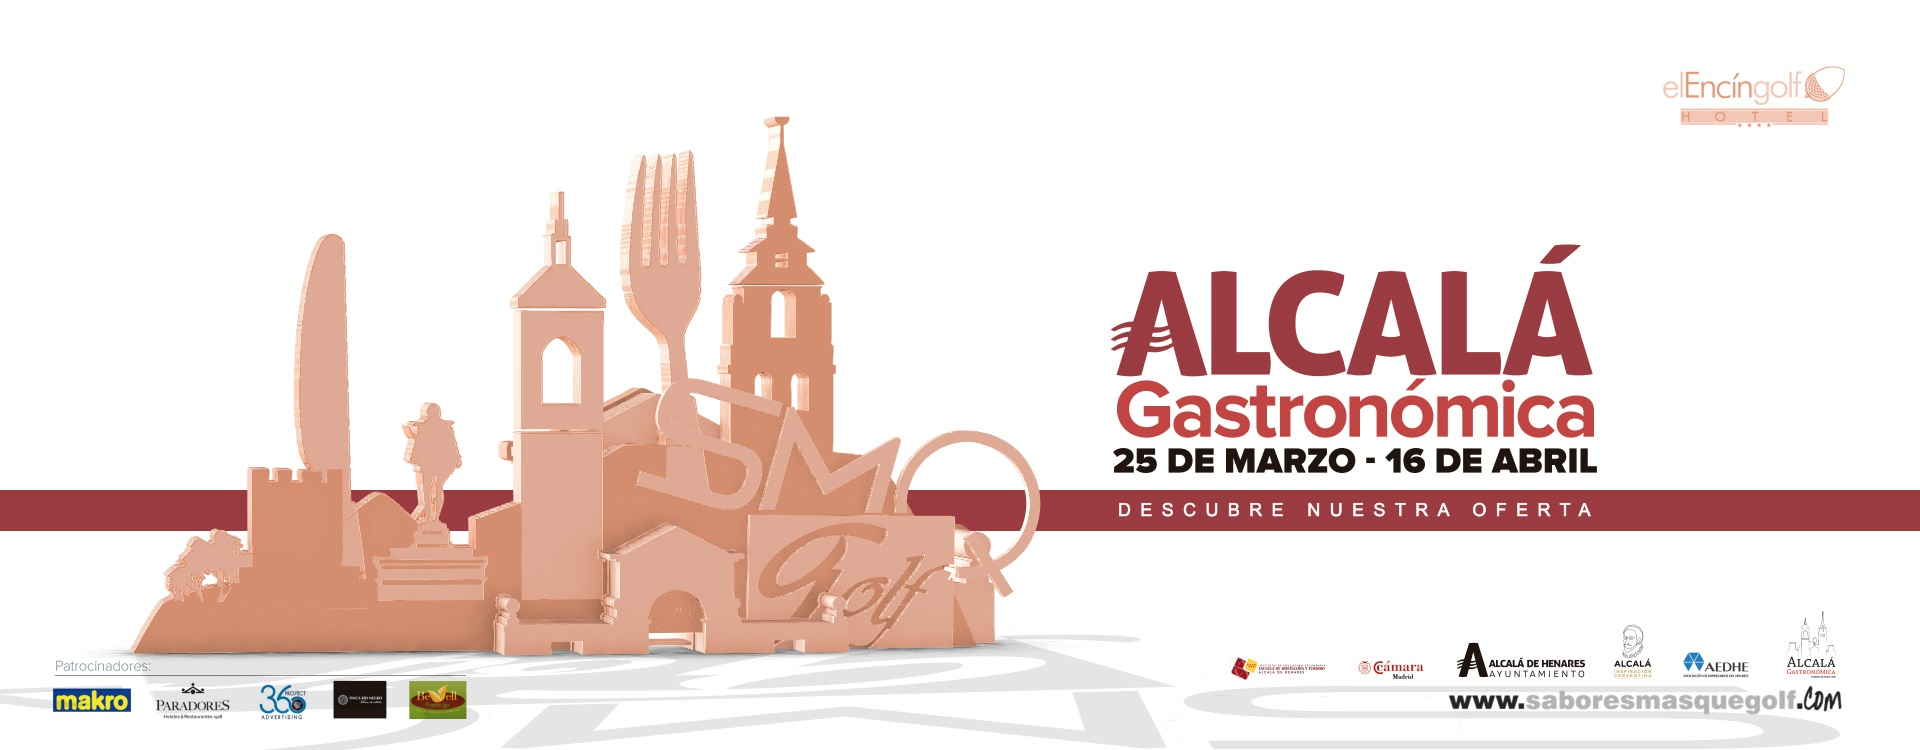 4º certamen Alcalá Gastronómica- vídeo presentación de producto para Encín Golf restaurante